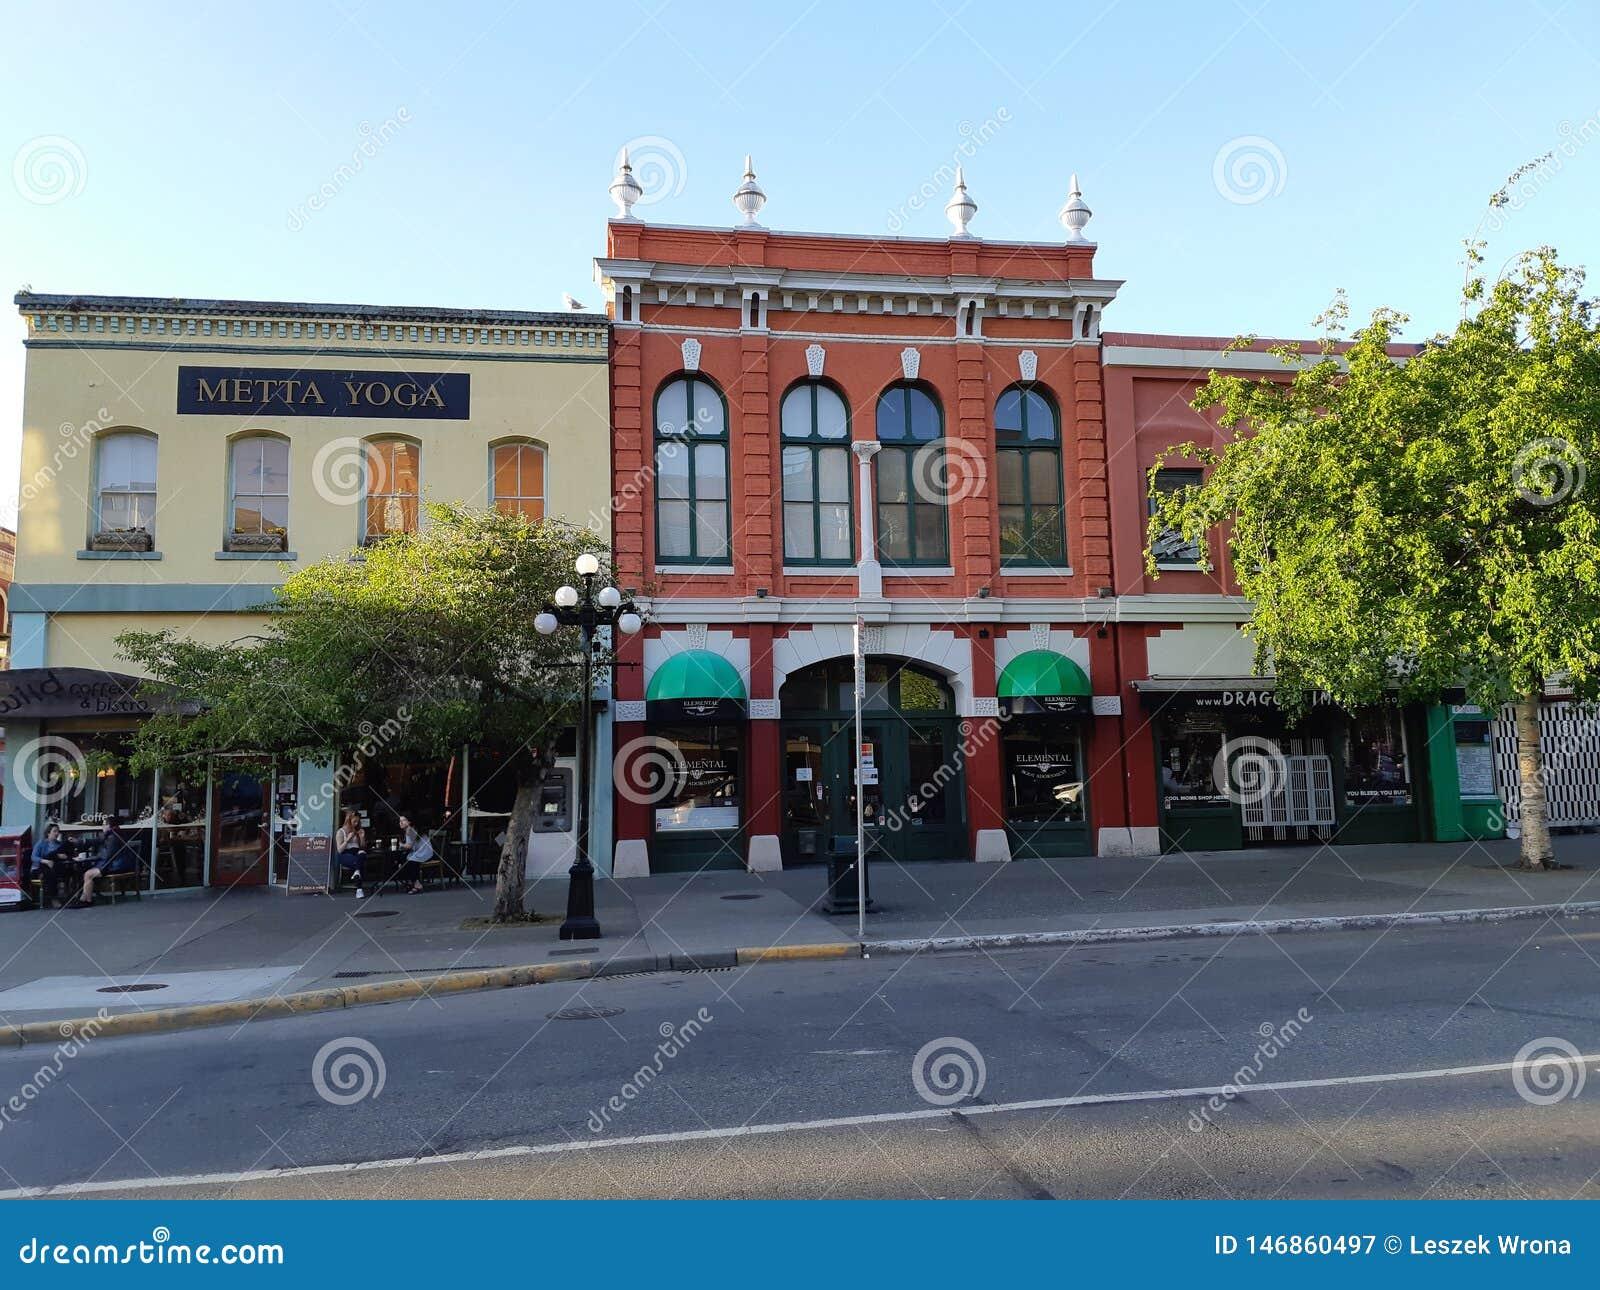 Historische Gebäude in im Stadtzentrum gelegener Victoria, Kanada